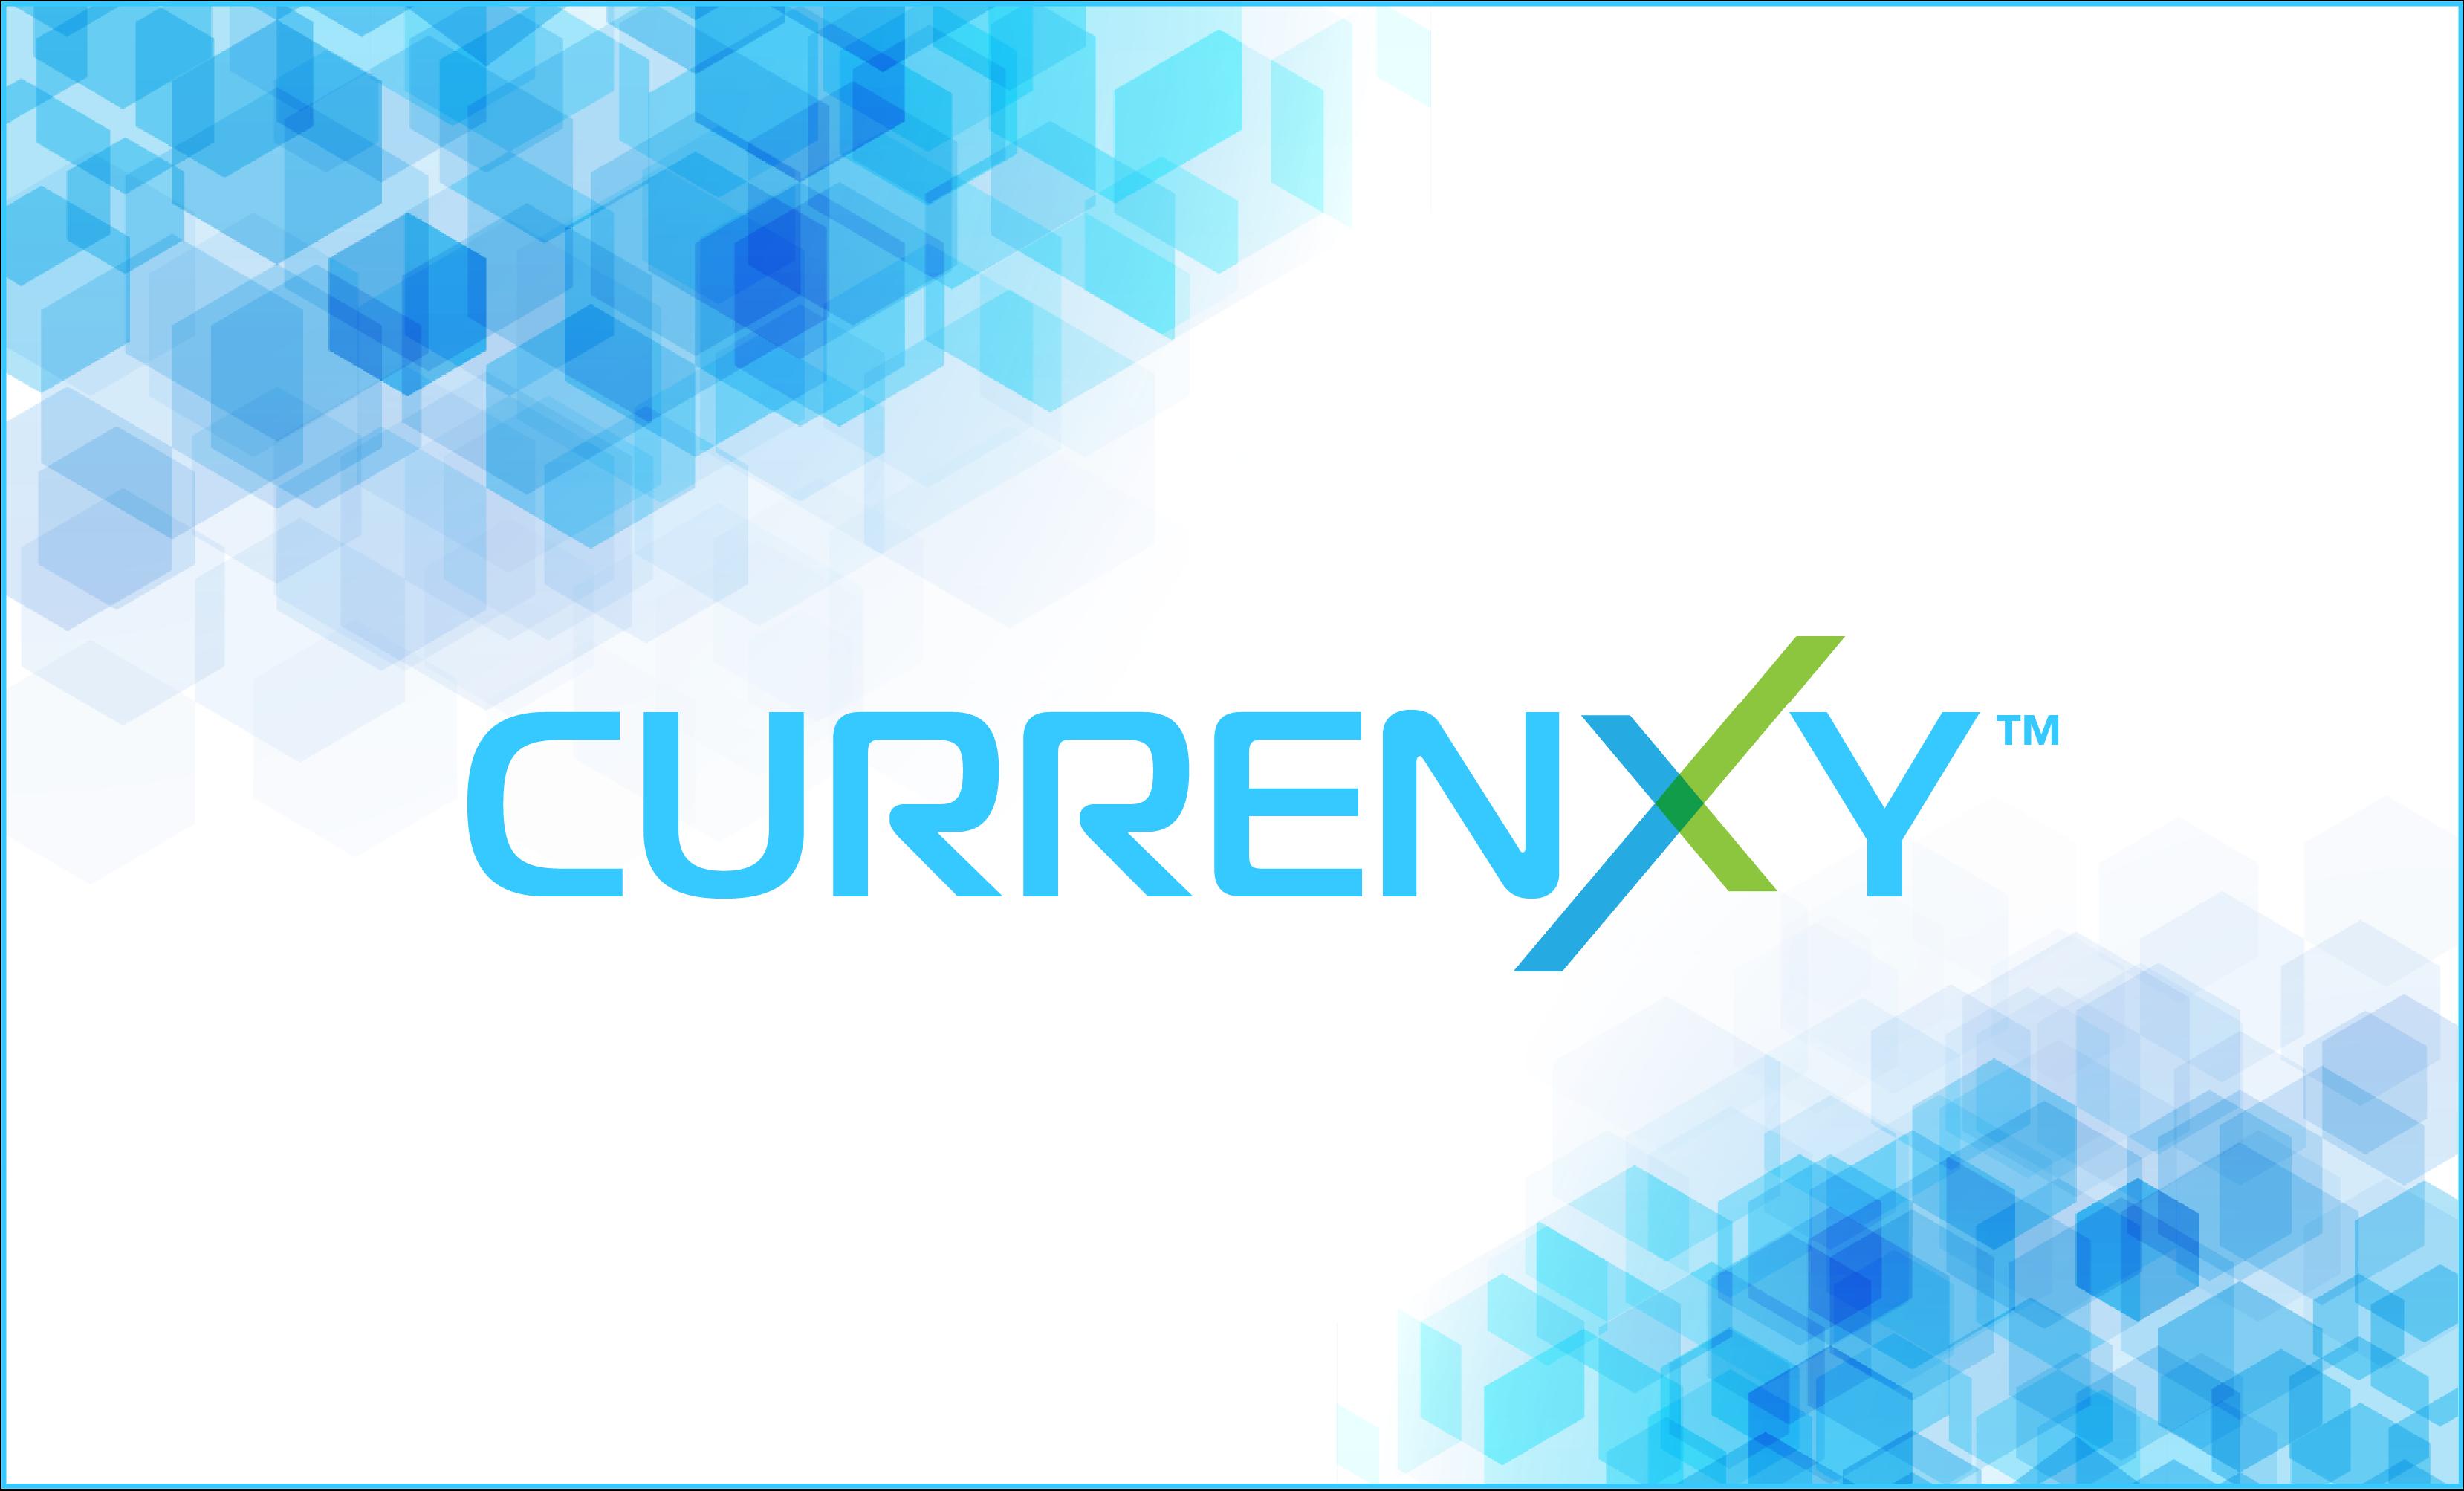 Currenxy